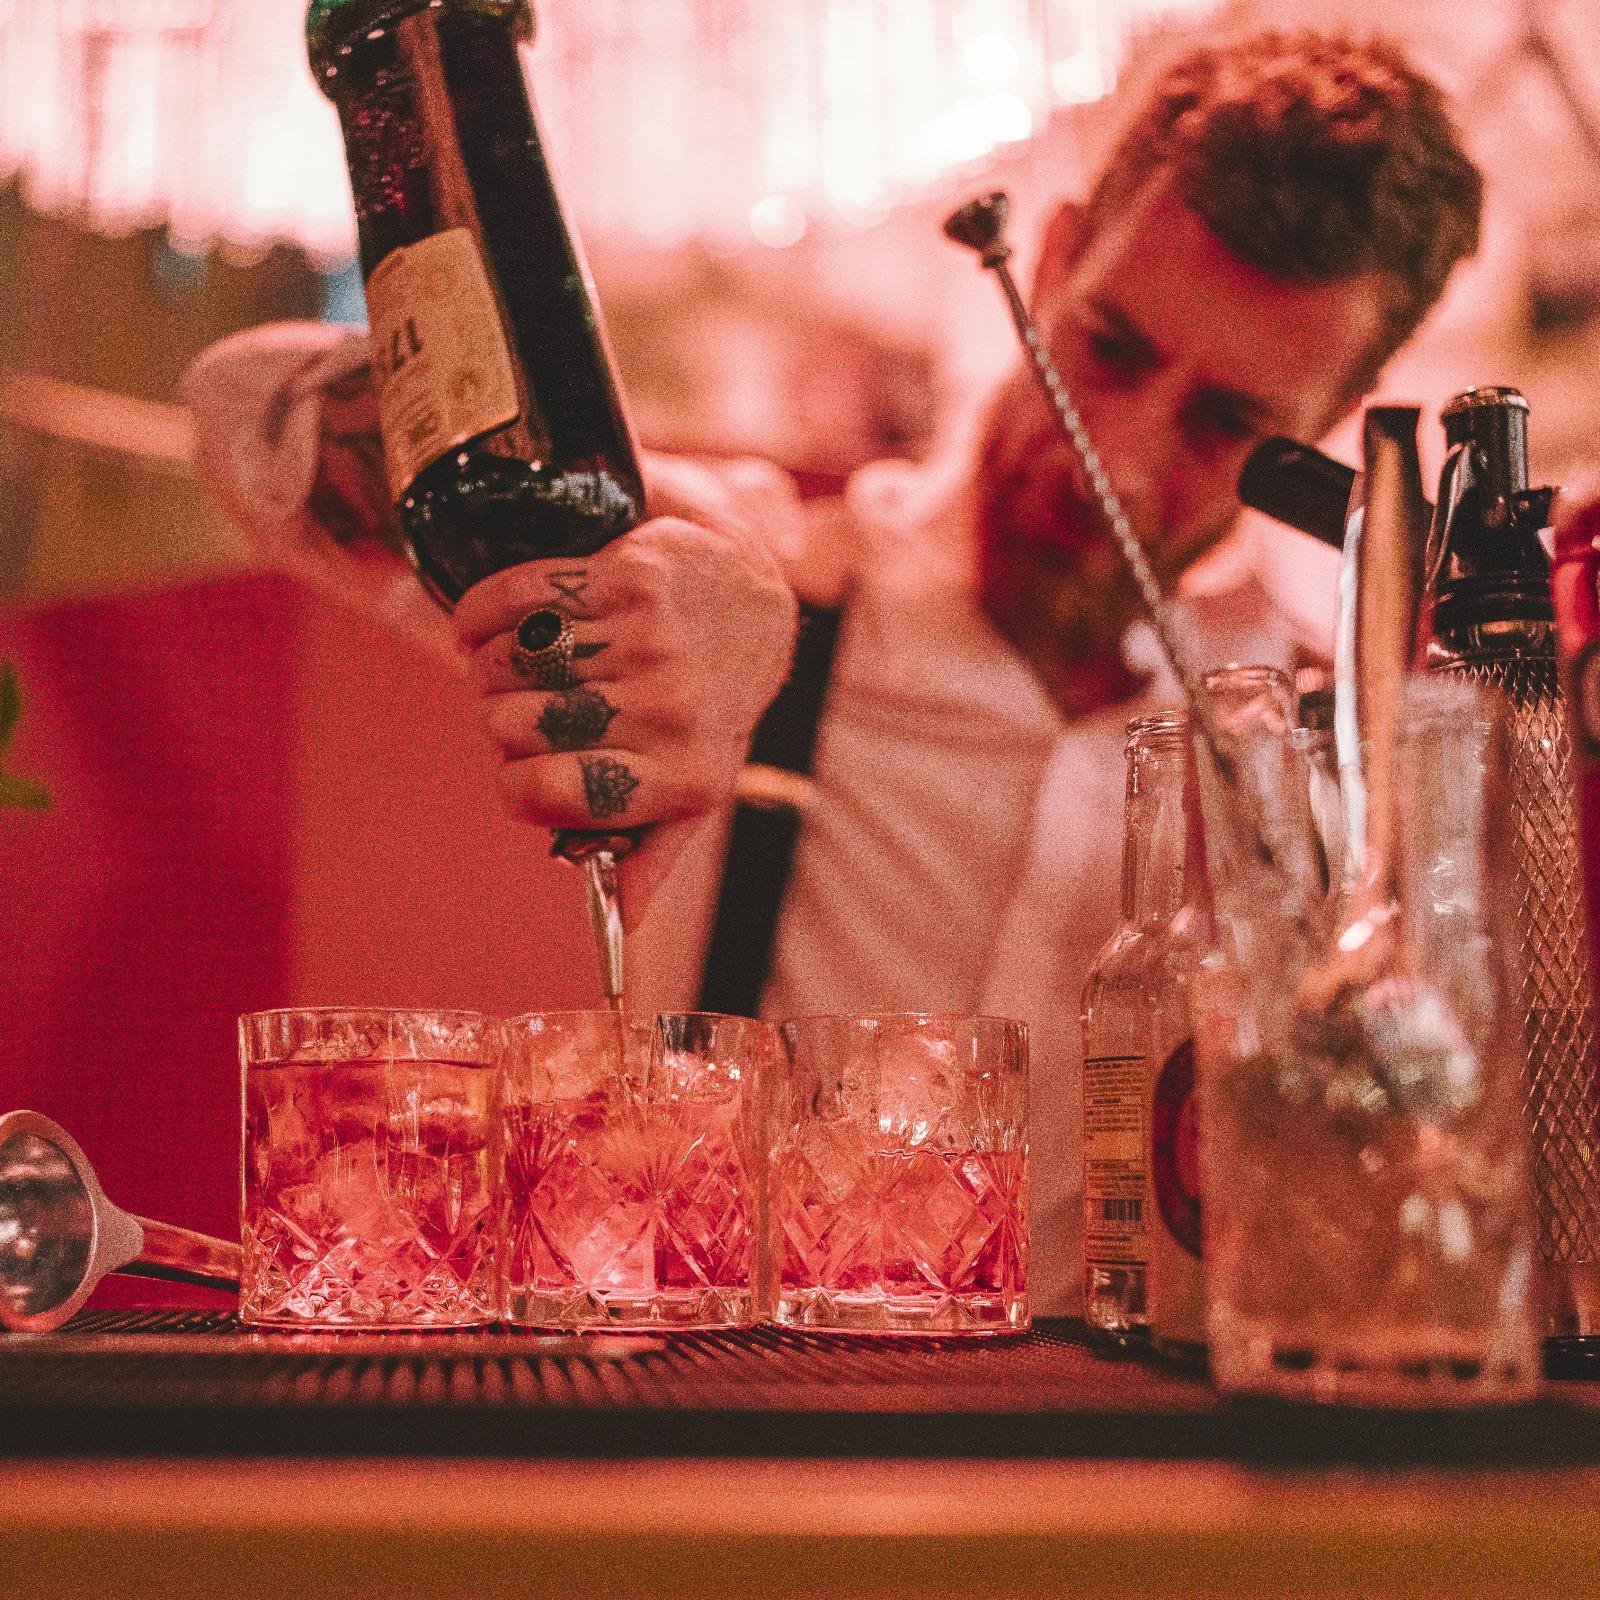 Bar Catering Noto #Ferragnez 01 robi tardelli